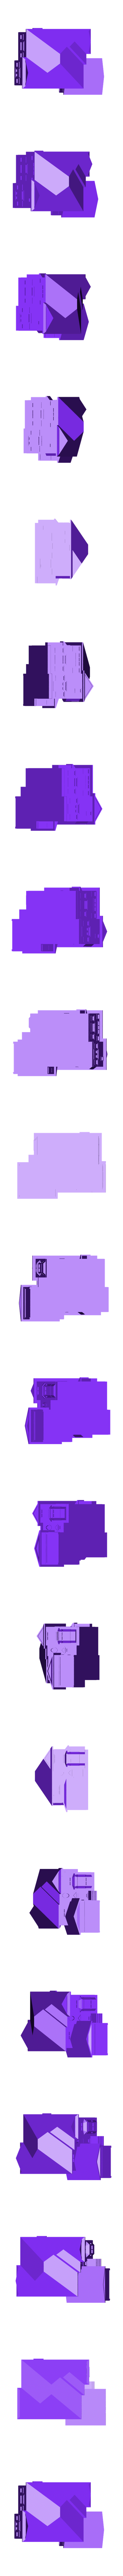 My_House.stl Download free STL file My Suburban House (N-Scale) • 3D printer object, MFouillard